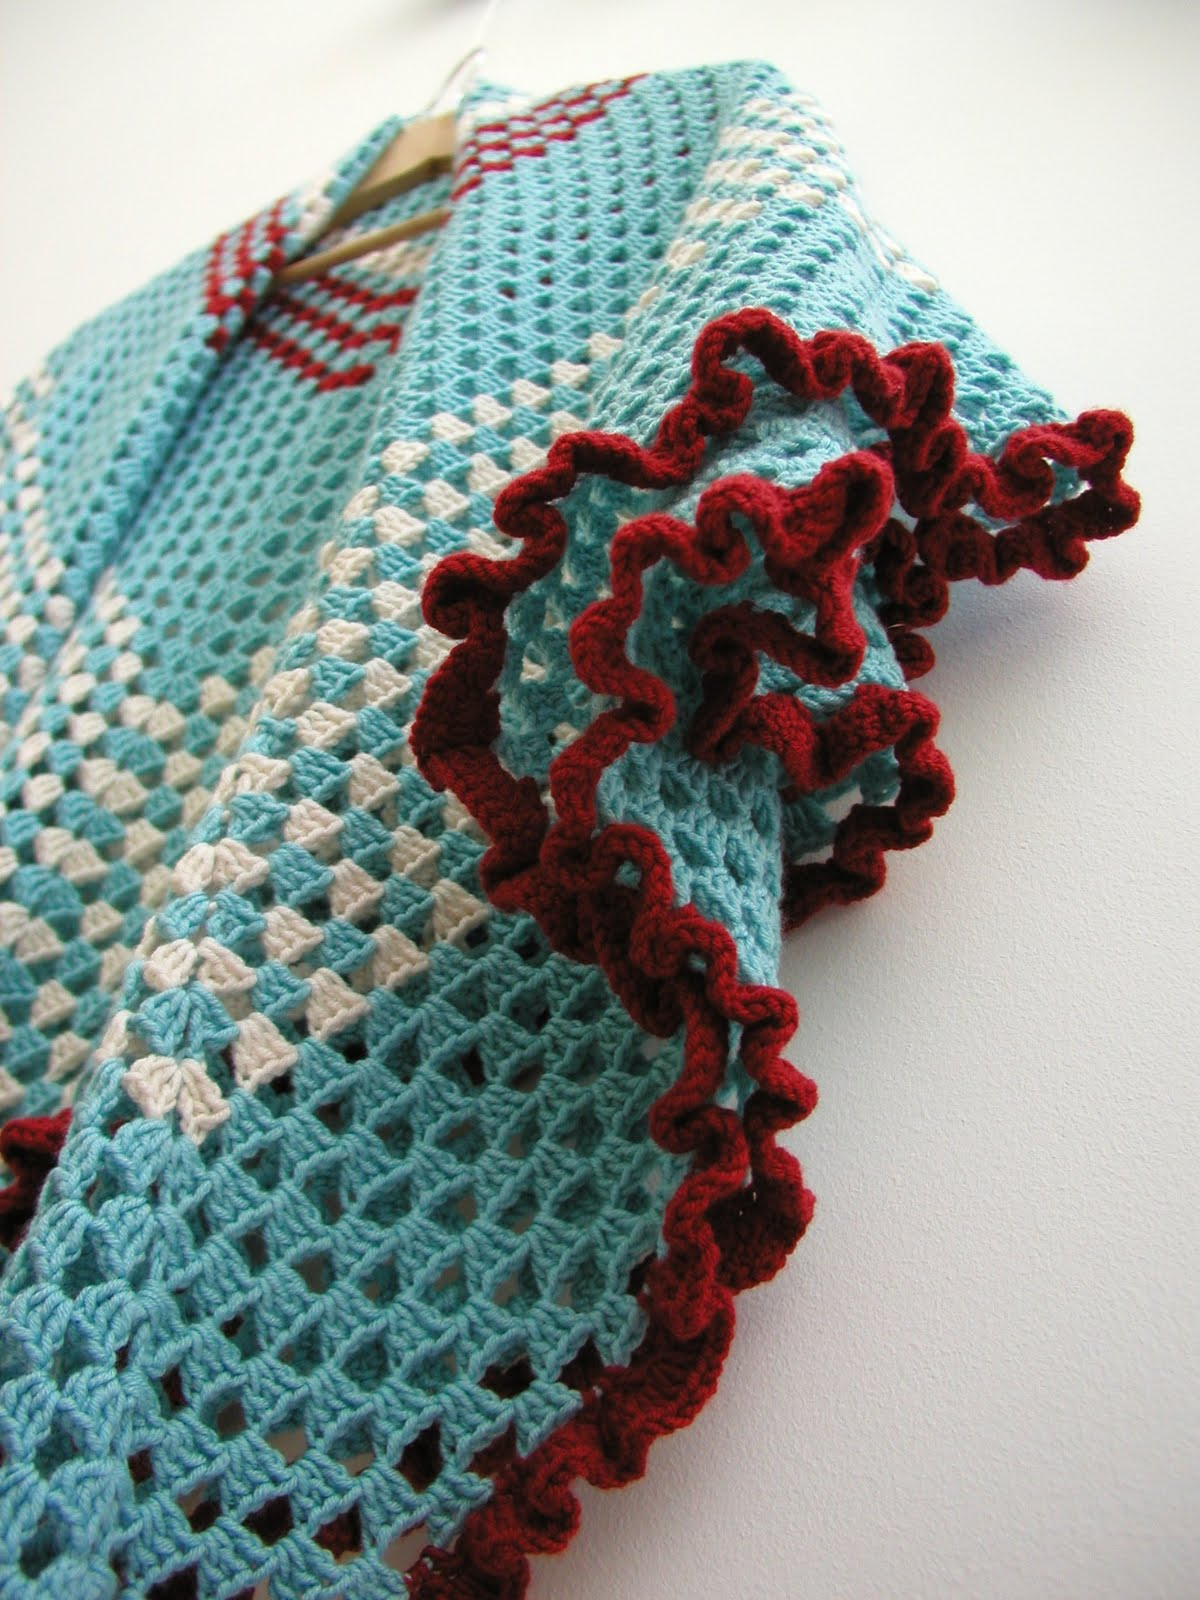 Hand Knitted Things Crochet Ruffle Throw